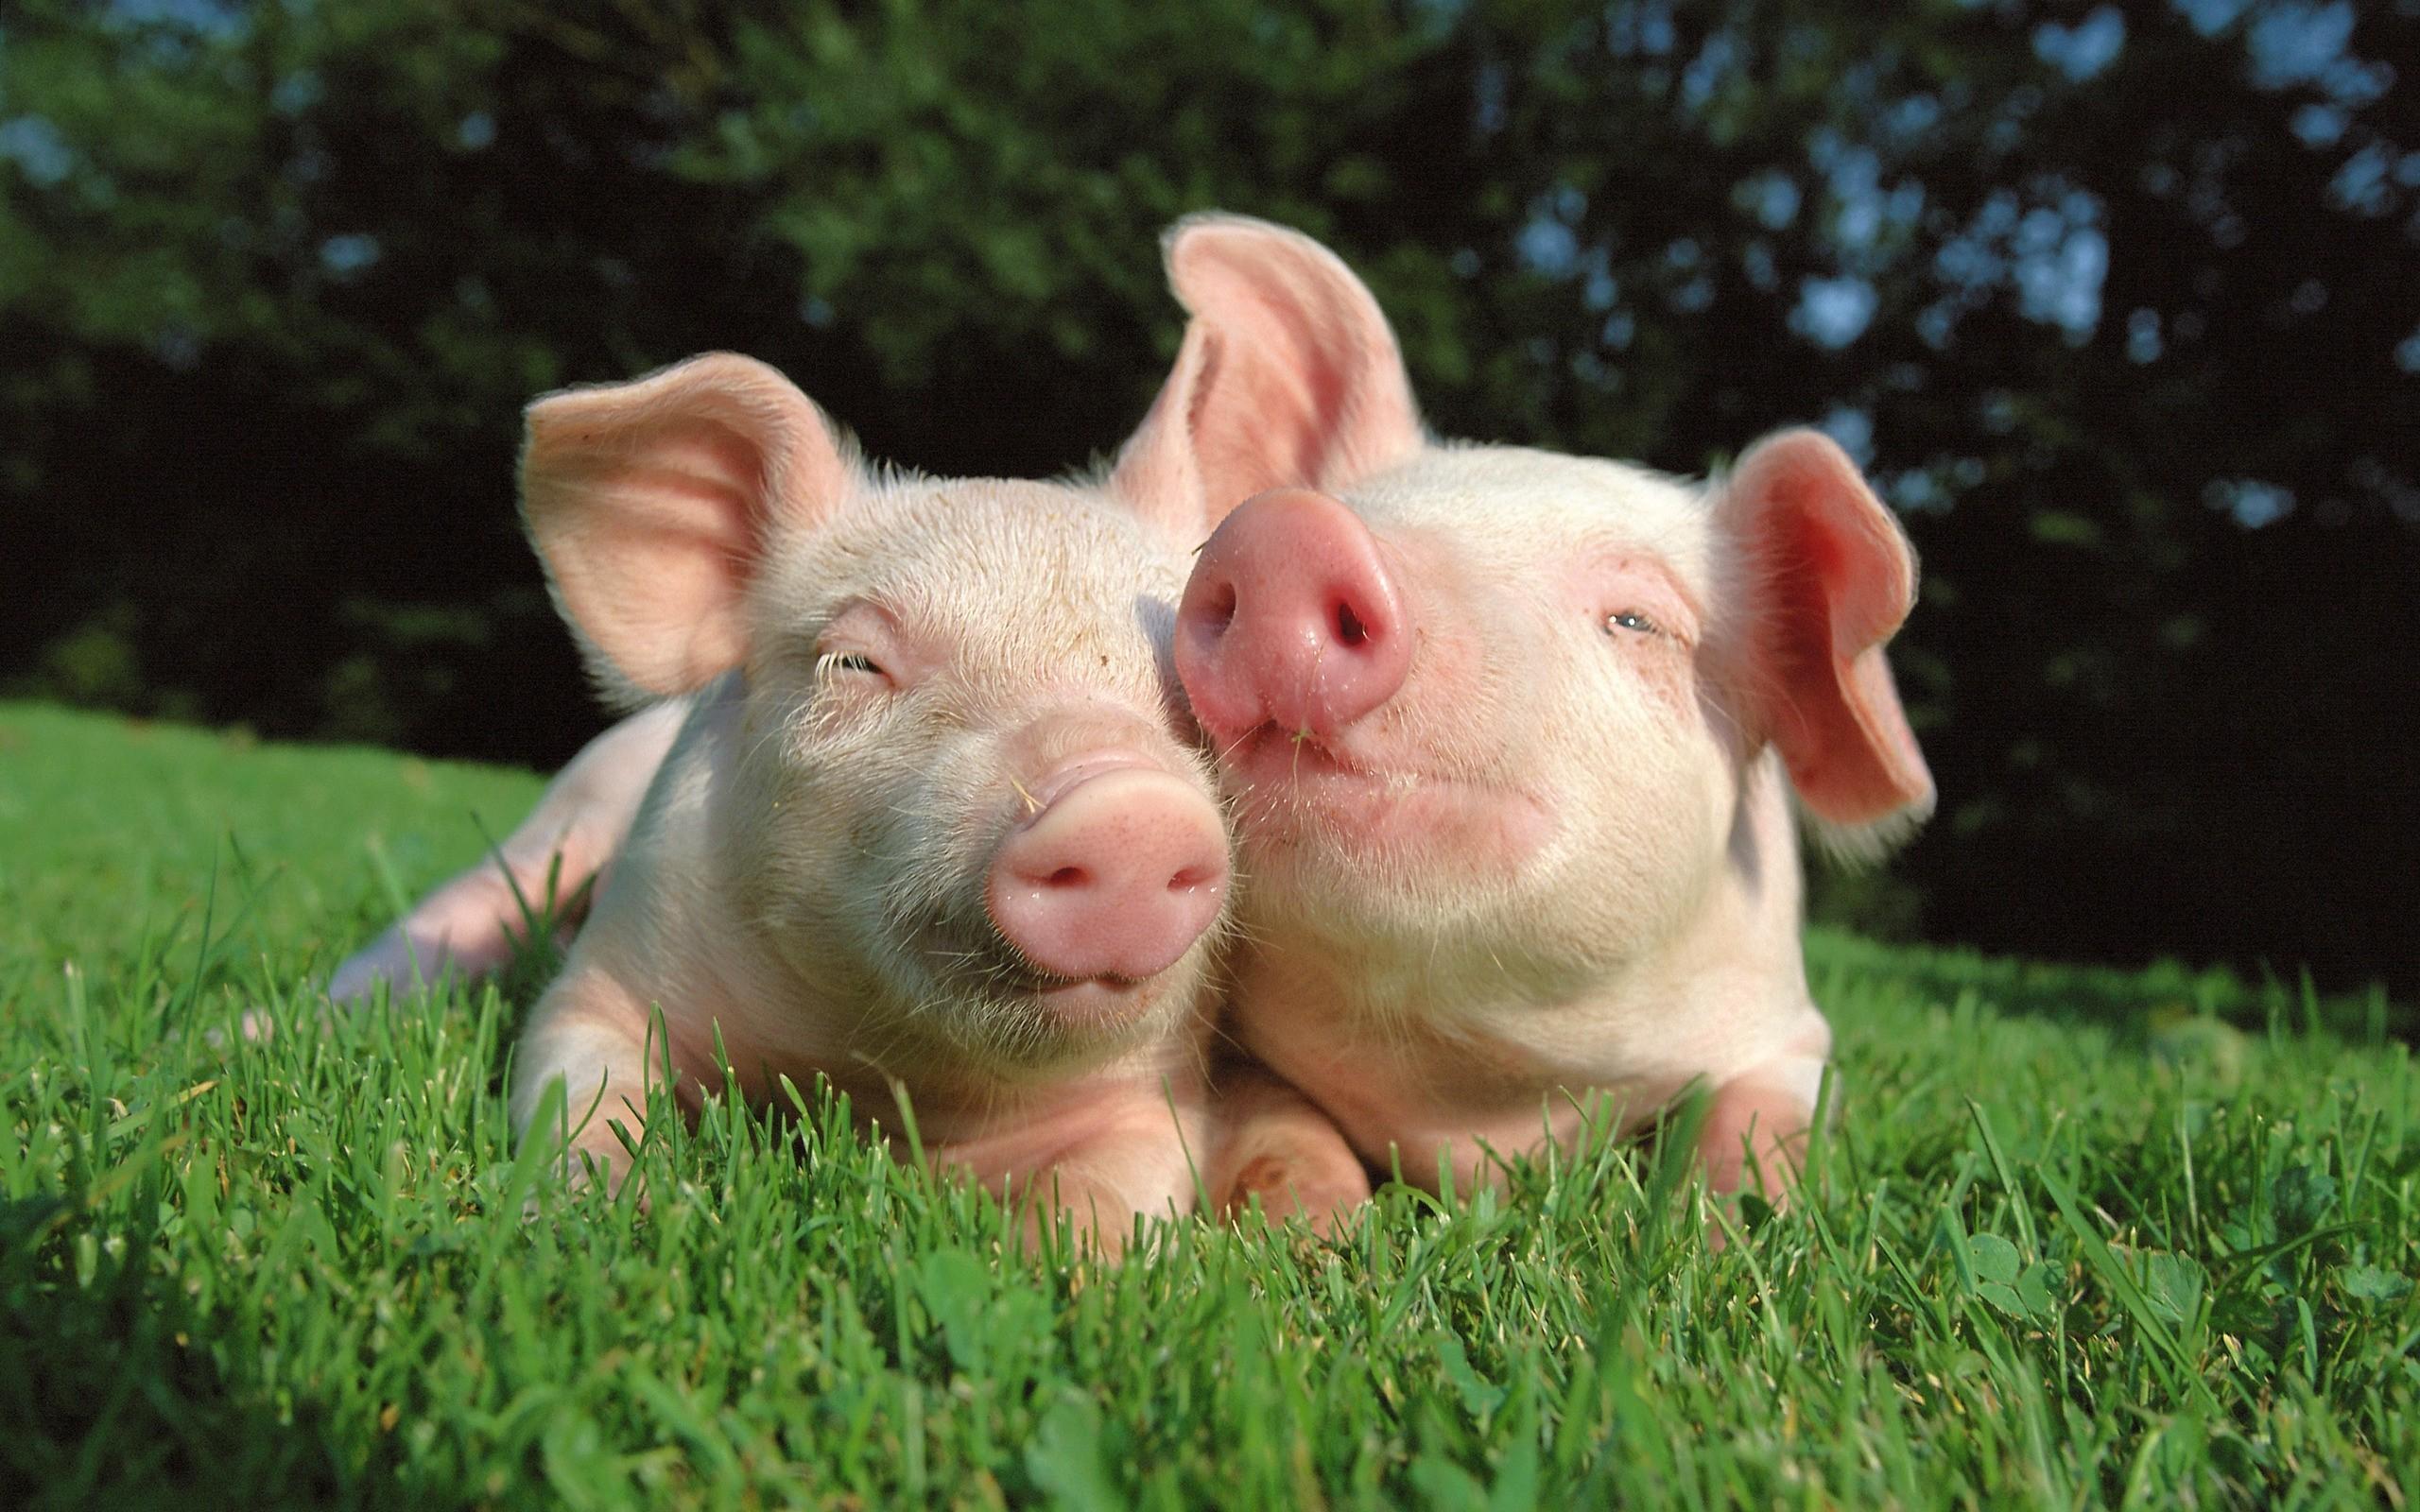 A Cute Baby Pig Wallpaper